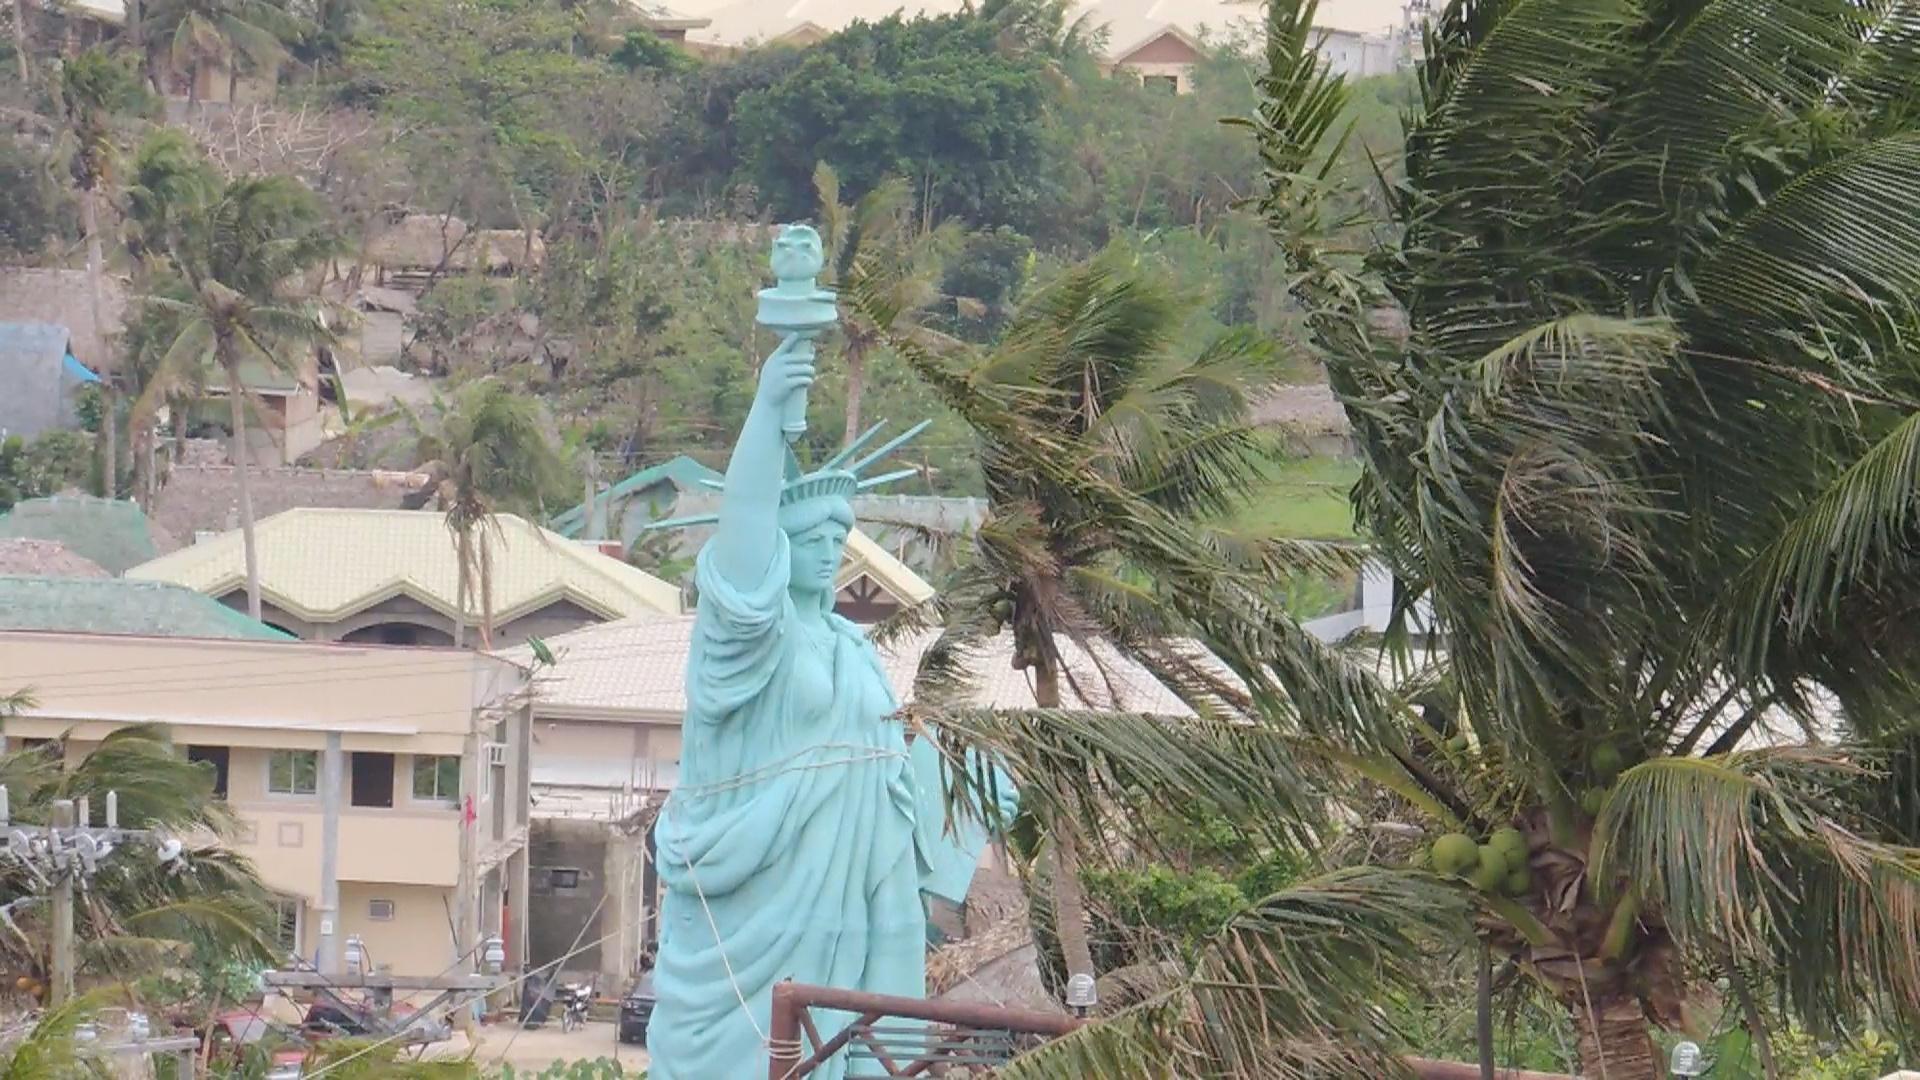 Hannah's resort Ilocos Norte Statue of Liberty